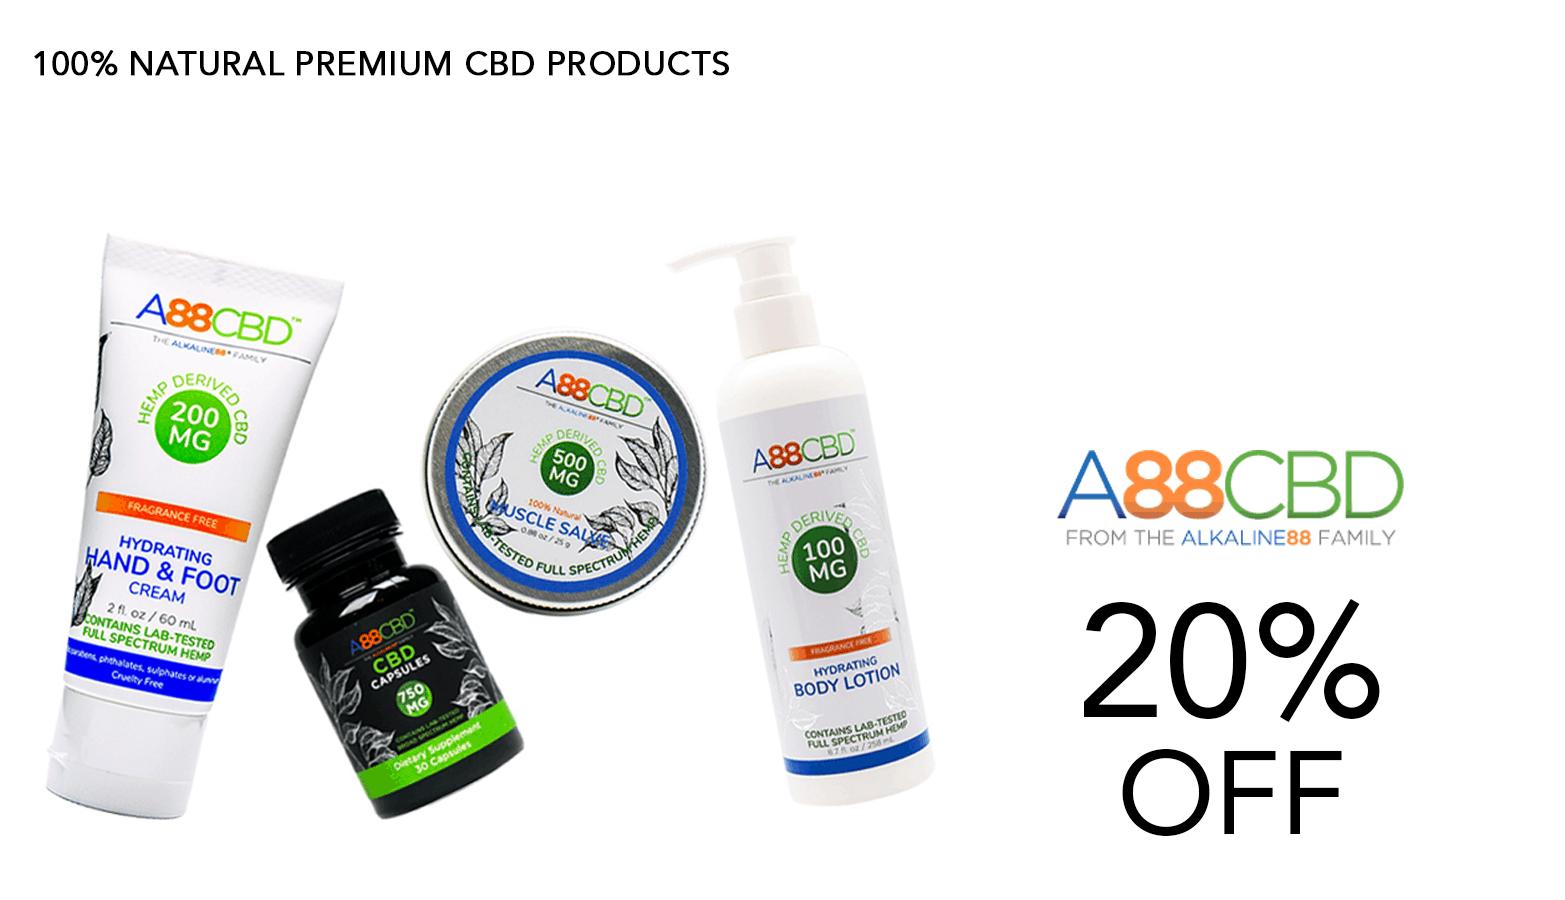 A88CBD Coupon Code Offer Website